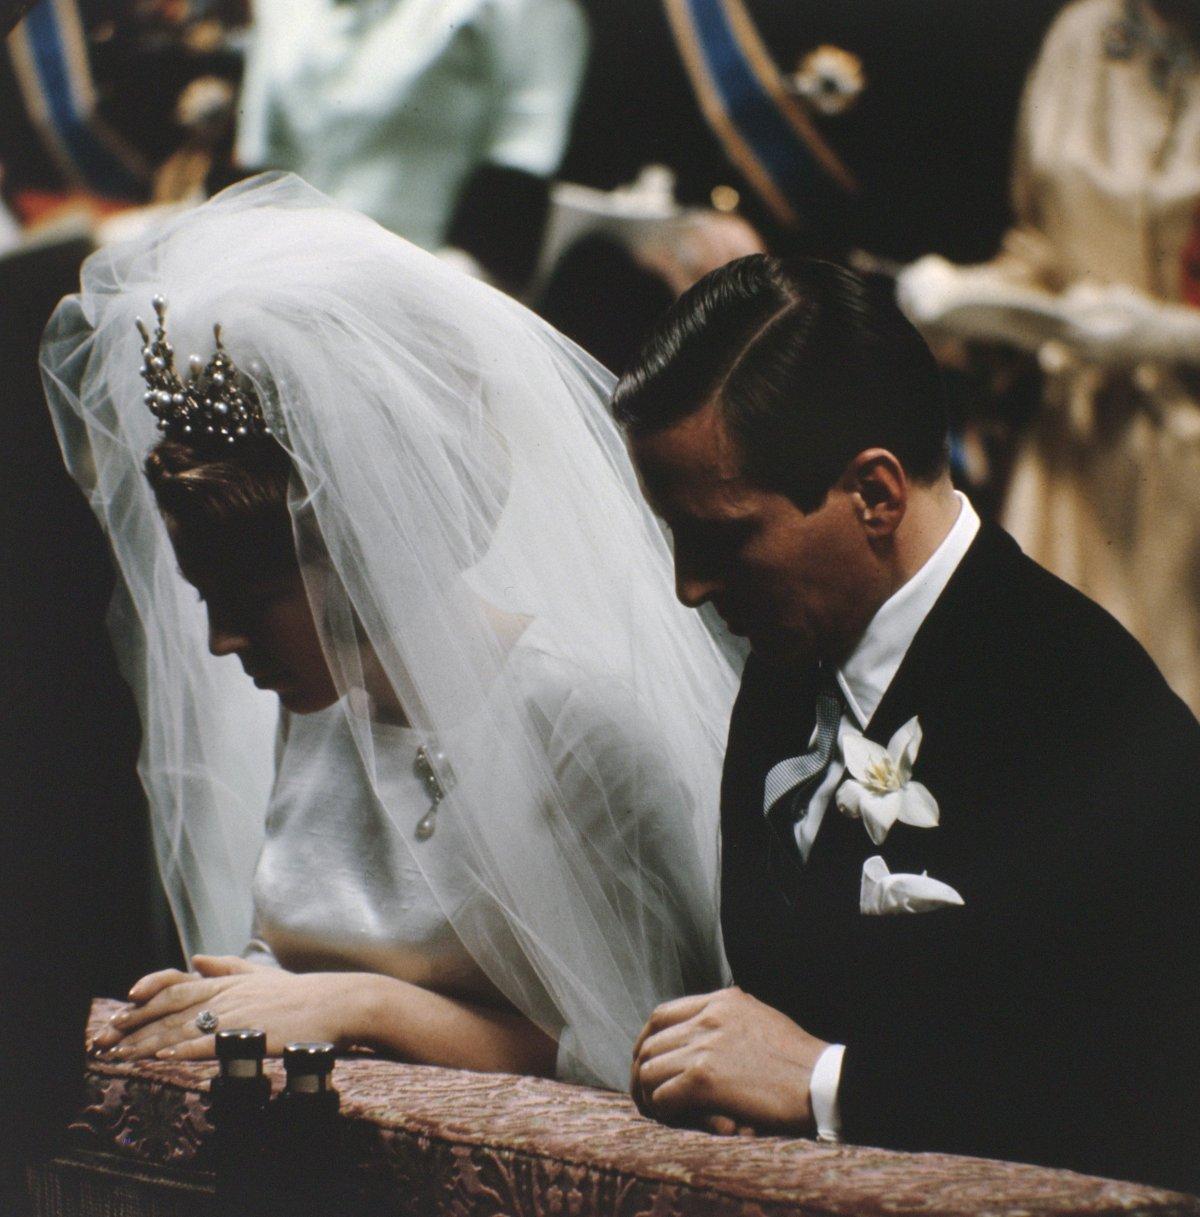 Wedding of Princess Beatrix and Prince Claus, 1966